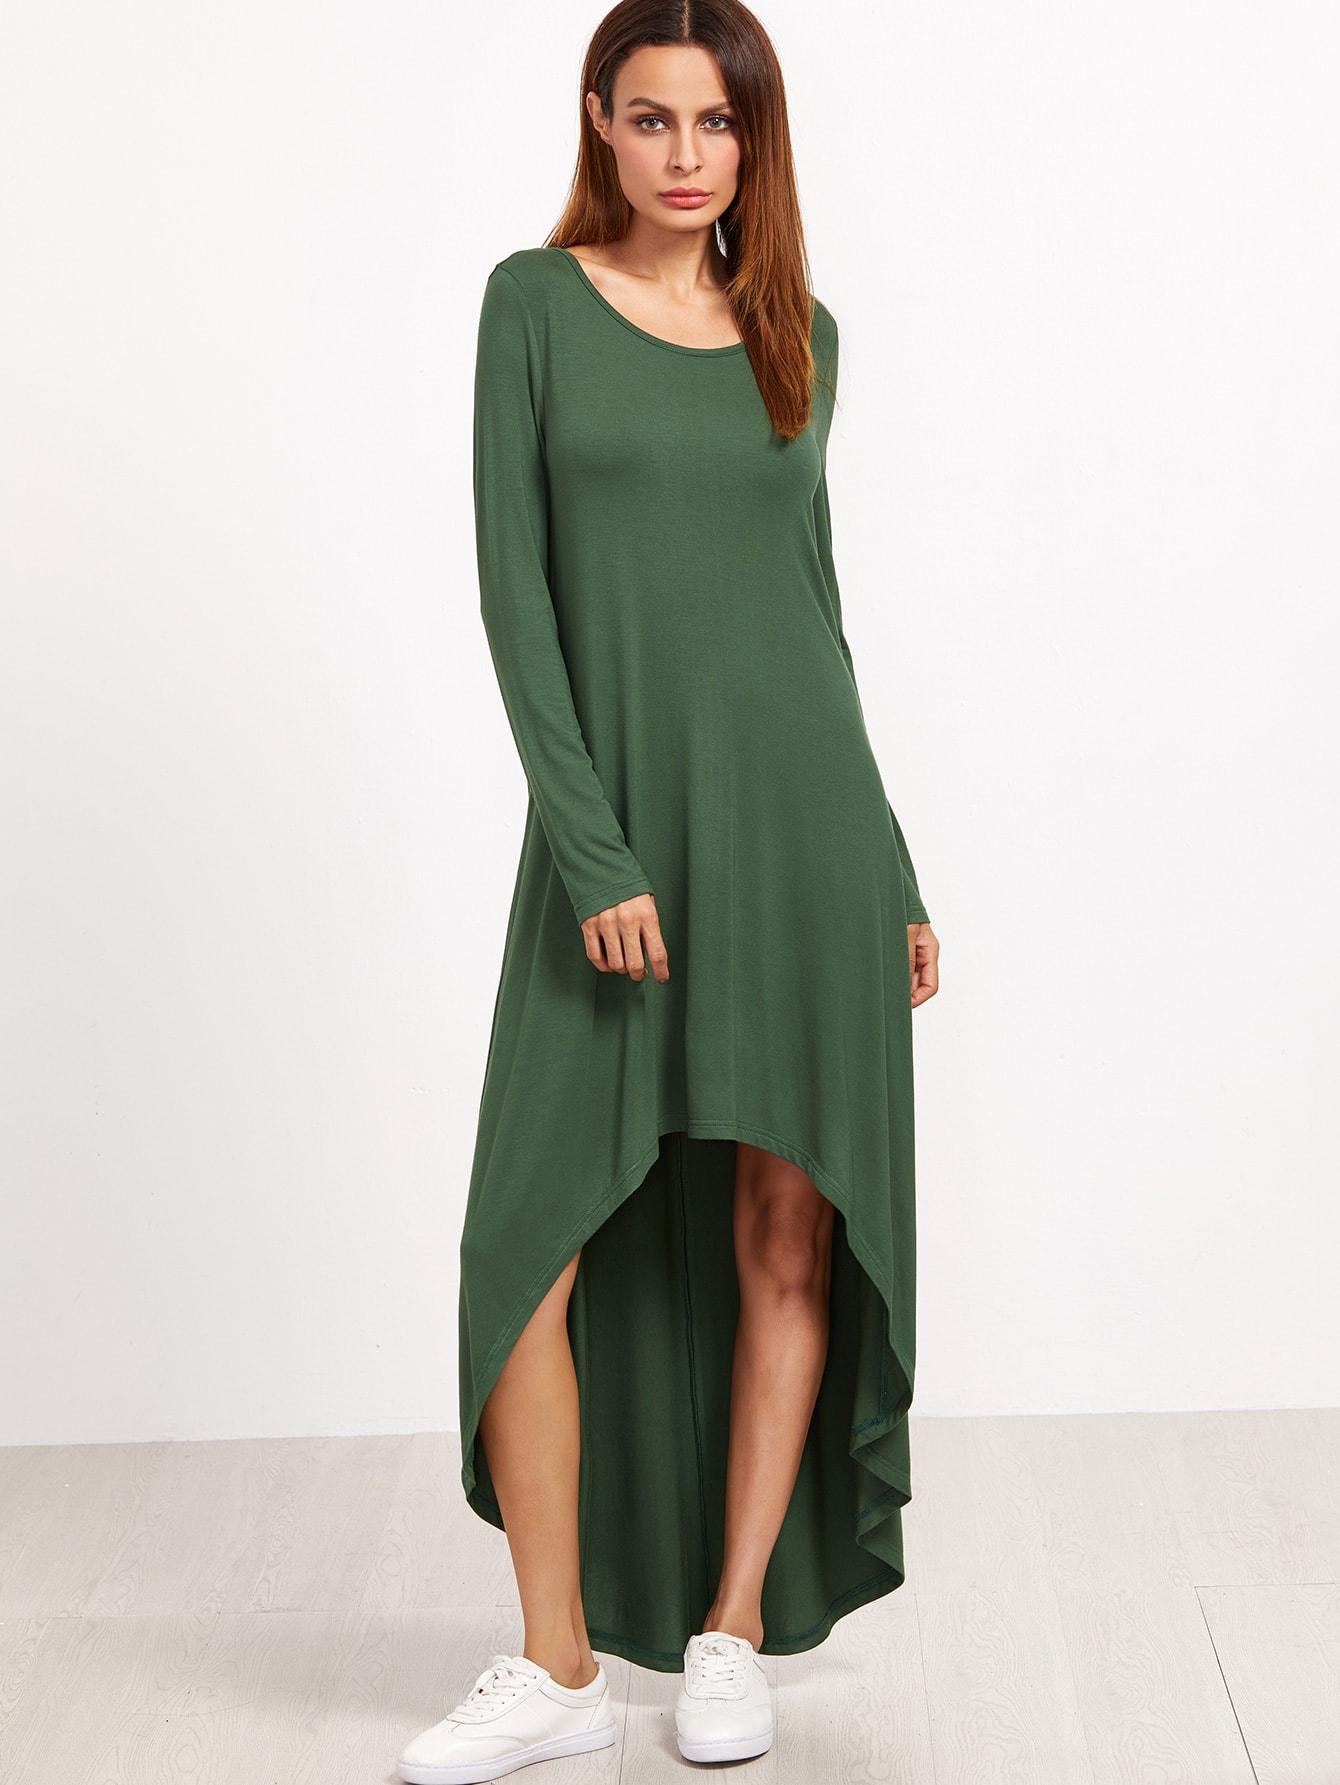 Kleid vorne kurz hinten lang grun